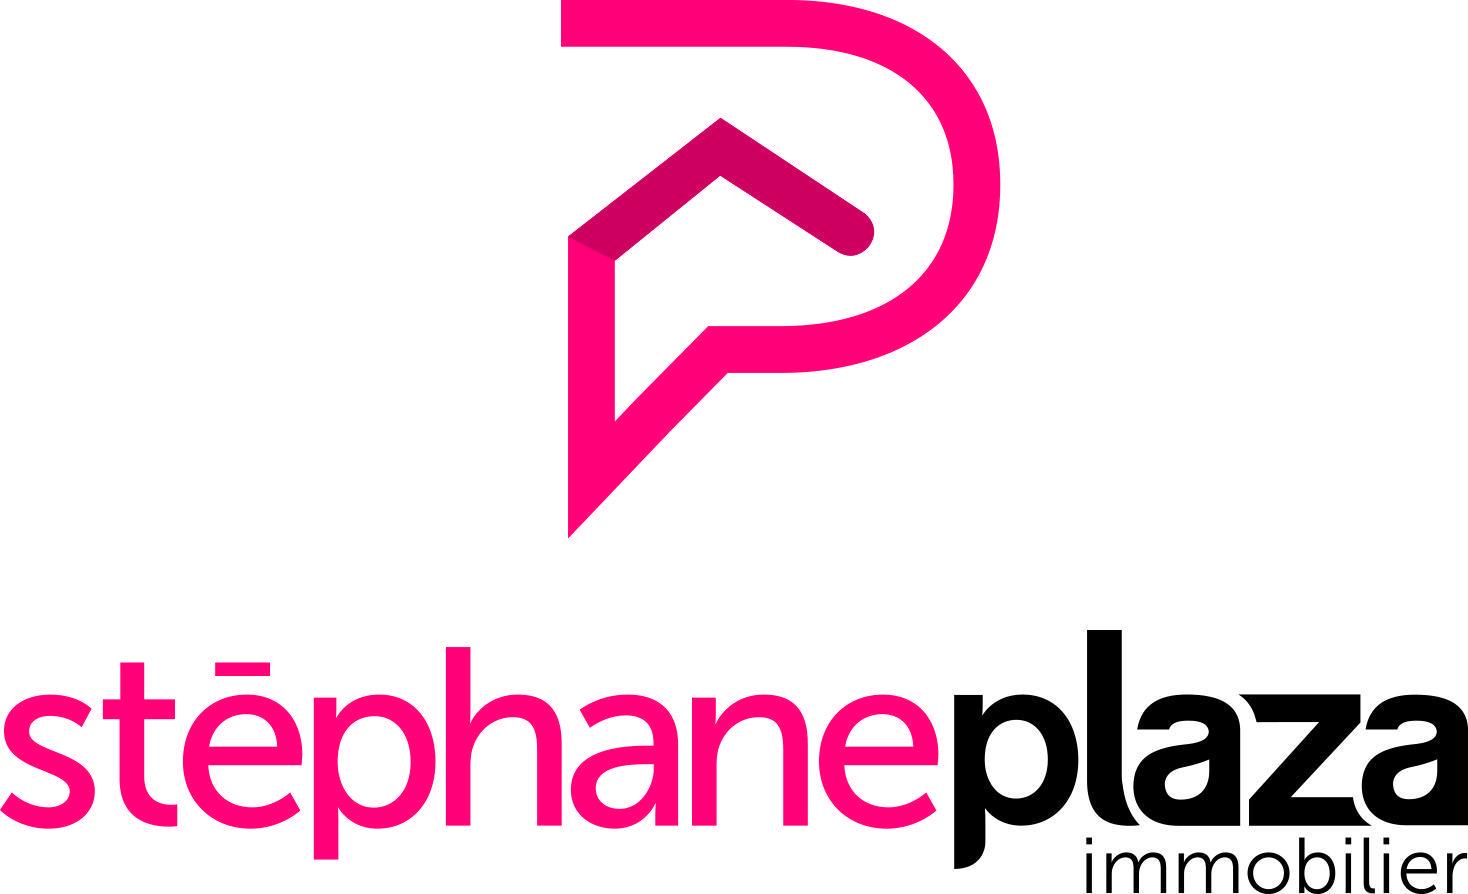 Stéphane Plaza Immobilier Douai agence immobilière Douai (59500)